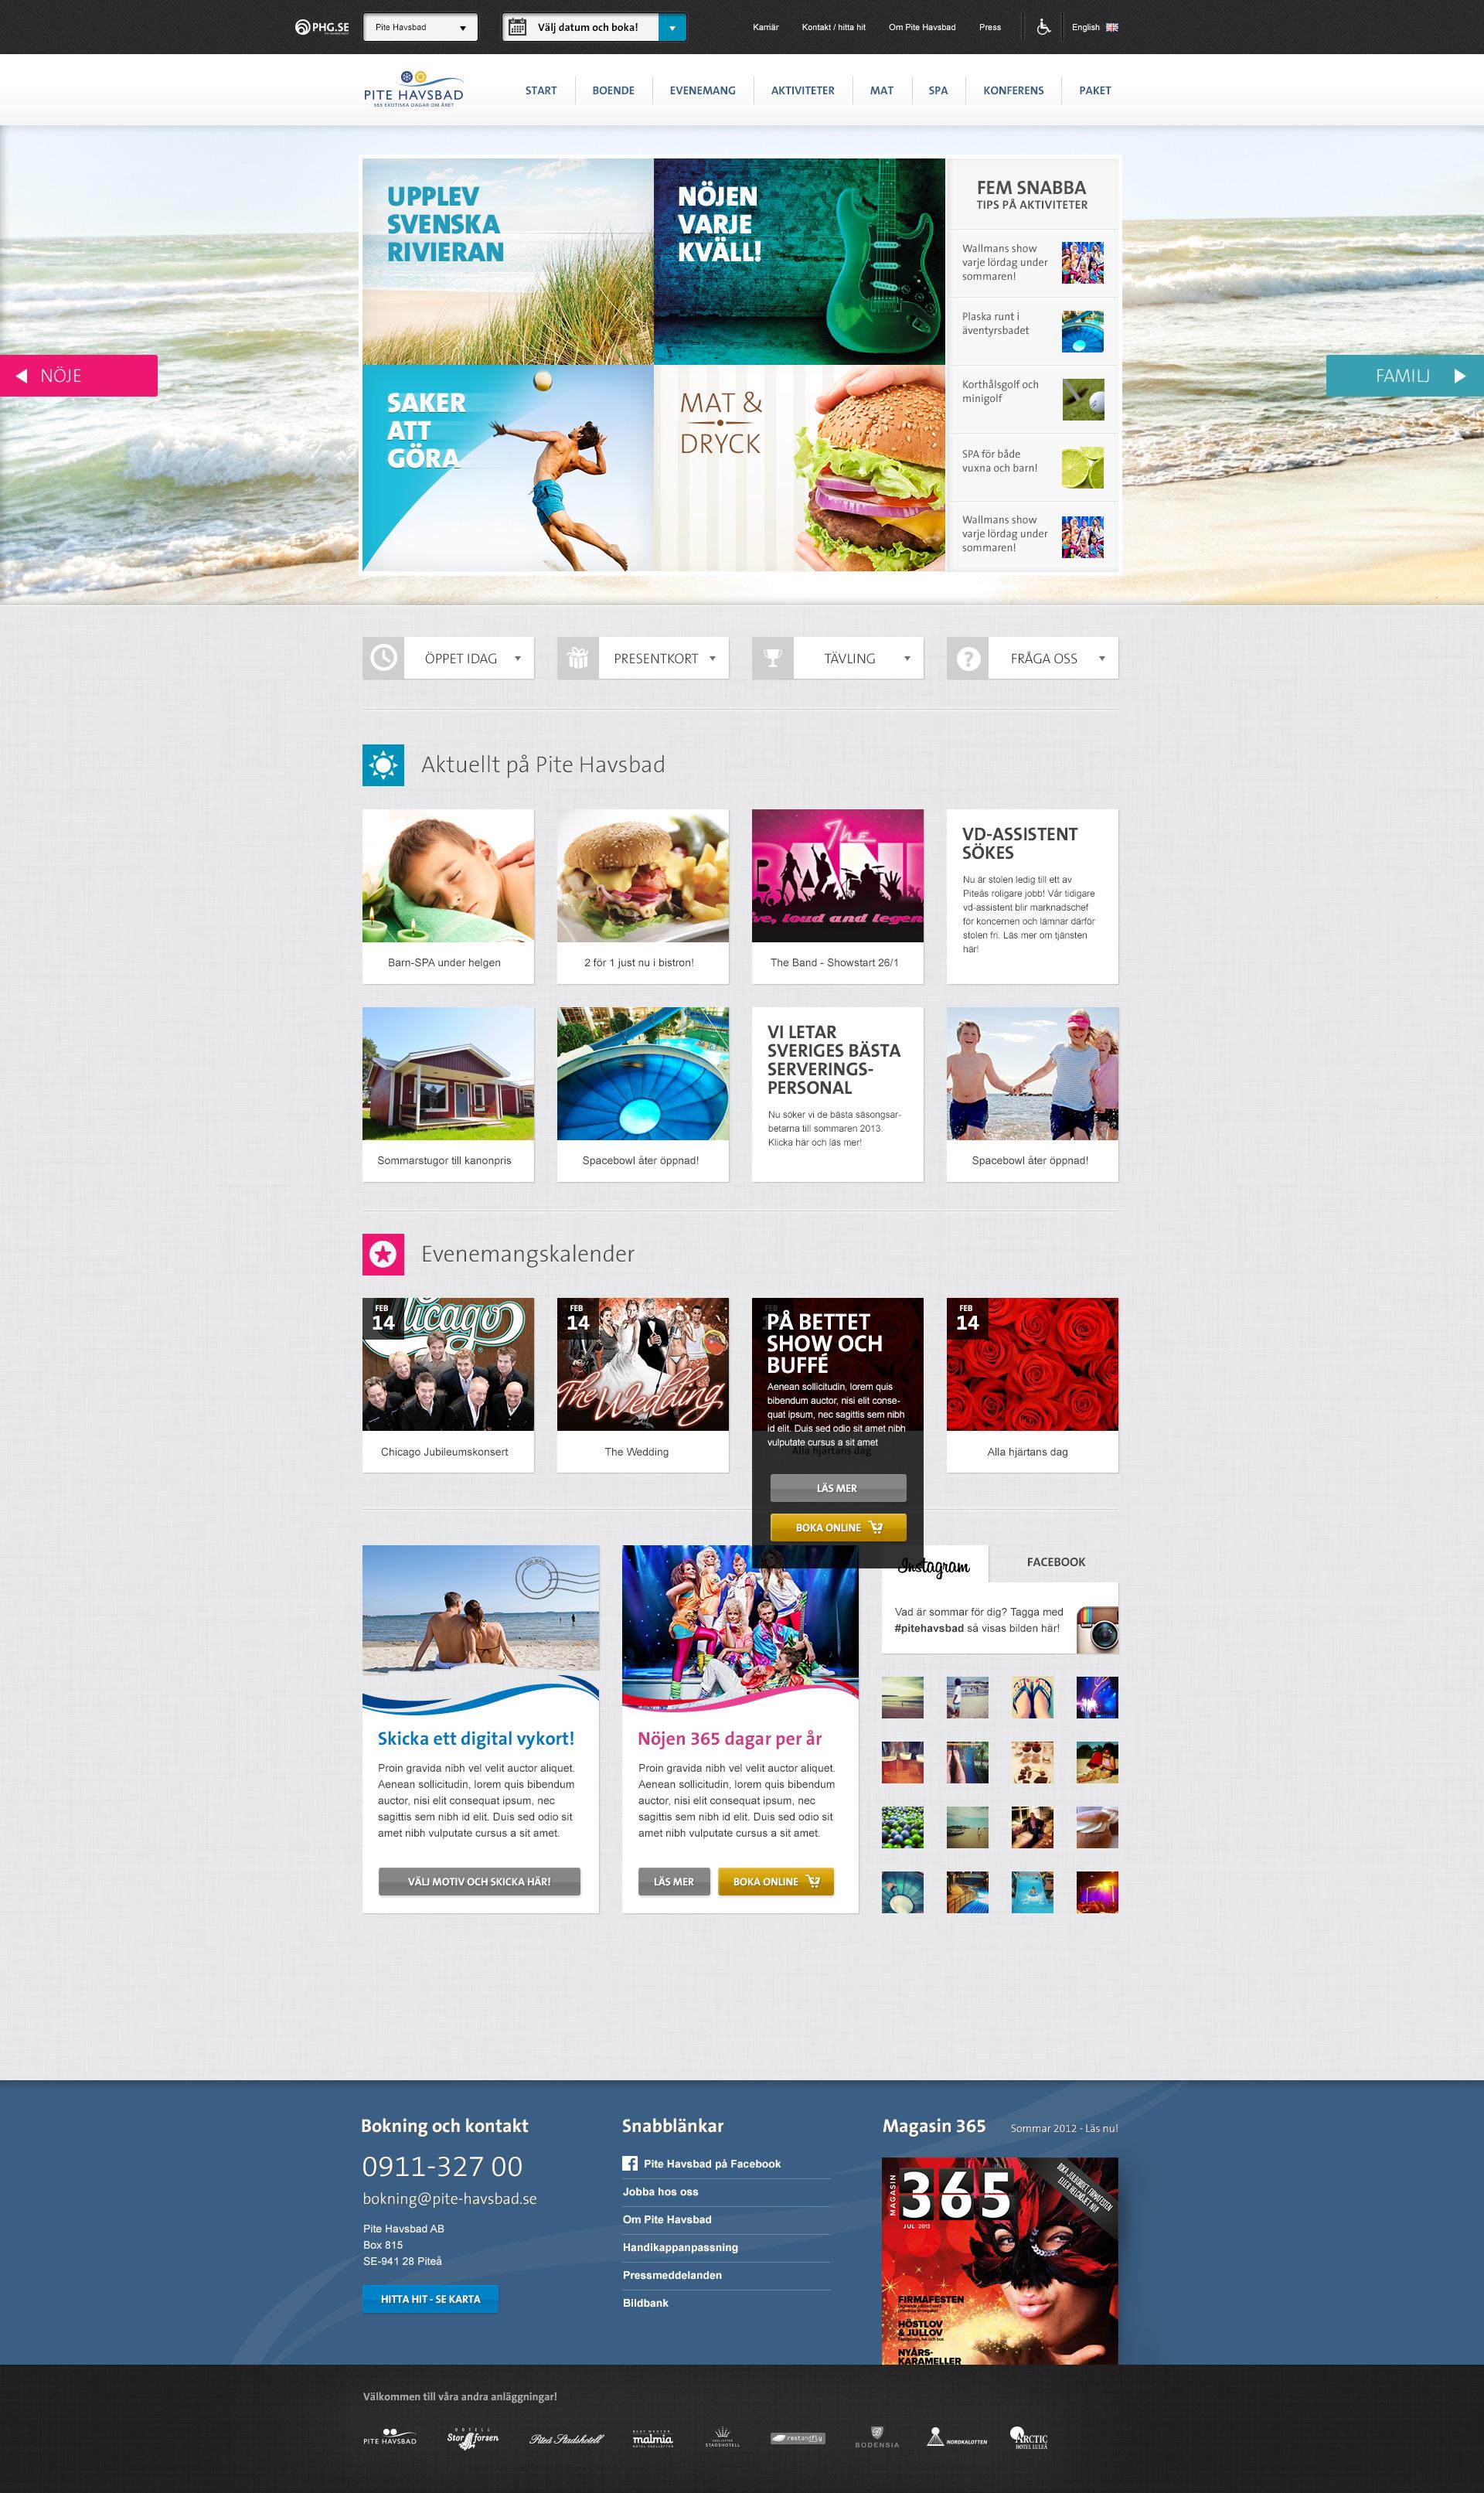 Pite Havsbad start page